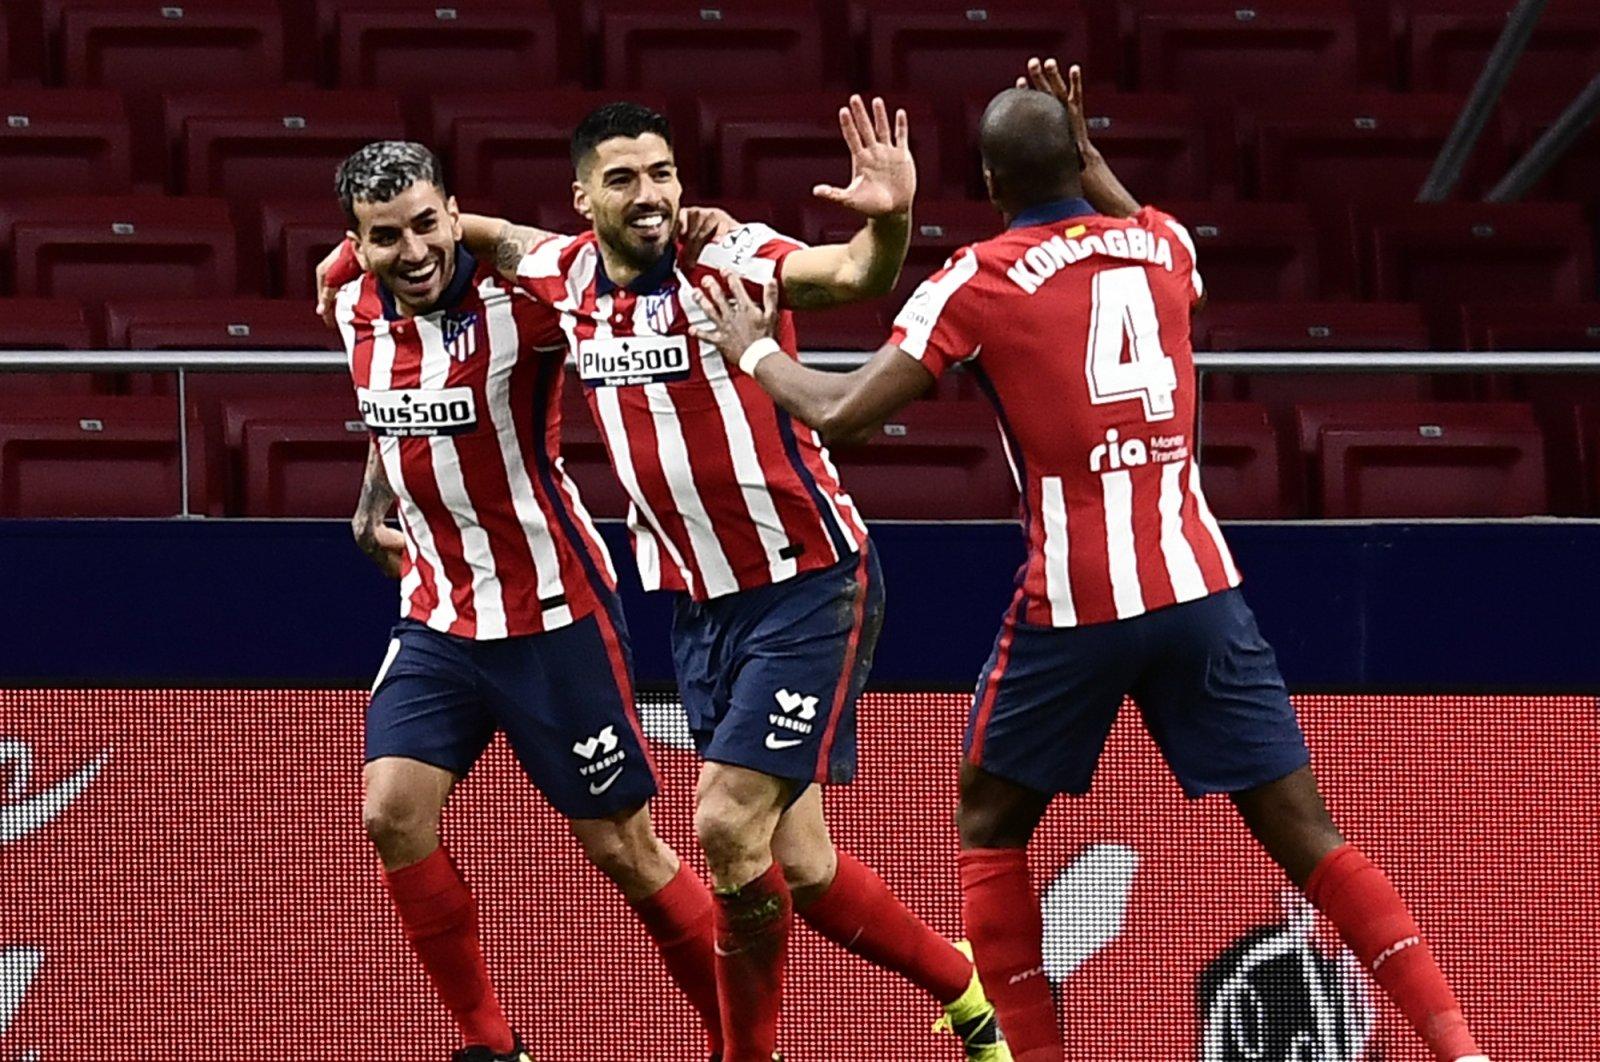 Atletico Madrid's Luis Suarez (C) celebrates with teammates after scoring against Celta at the Wanda Metropolitano Stadium, Madrid, Spain, Feb. 8, 2021. (AP Photo)